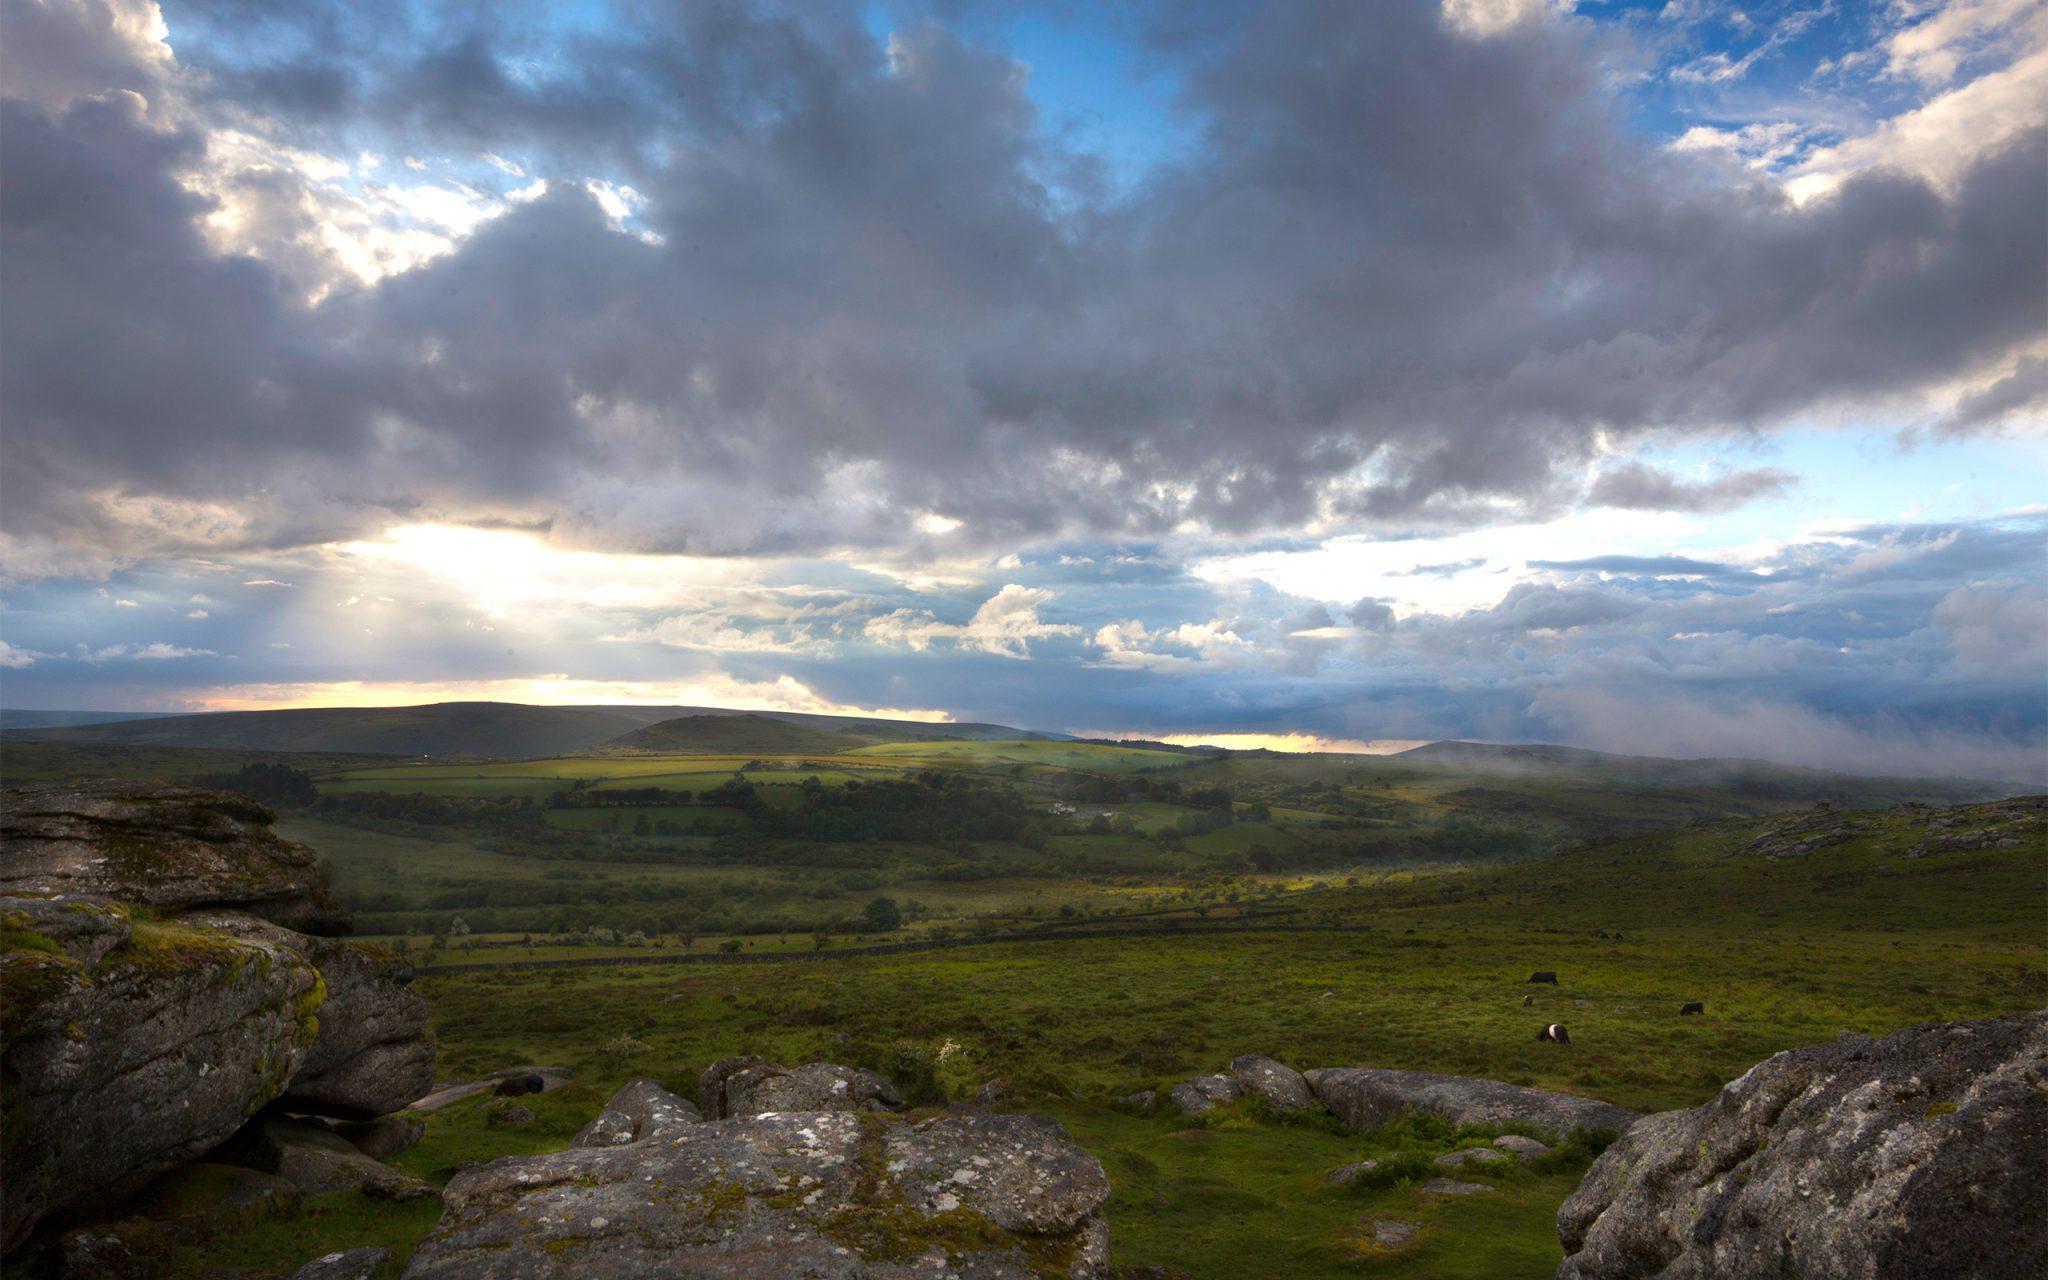 Dartmoor, Devon. Between Saddle Tor and Bone Hill rocks, looking west. Carey Marks Photography